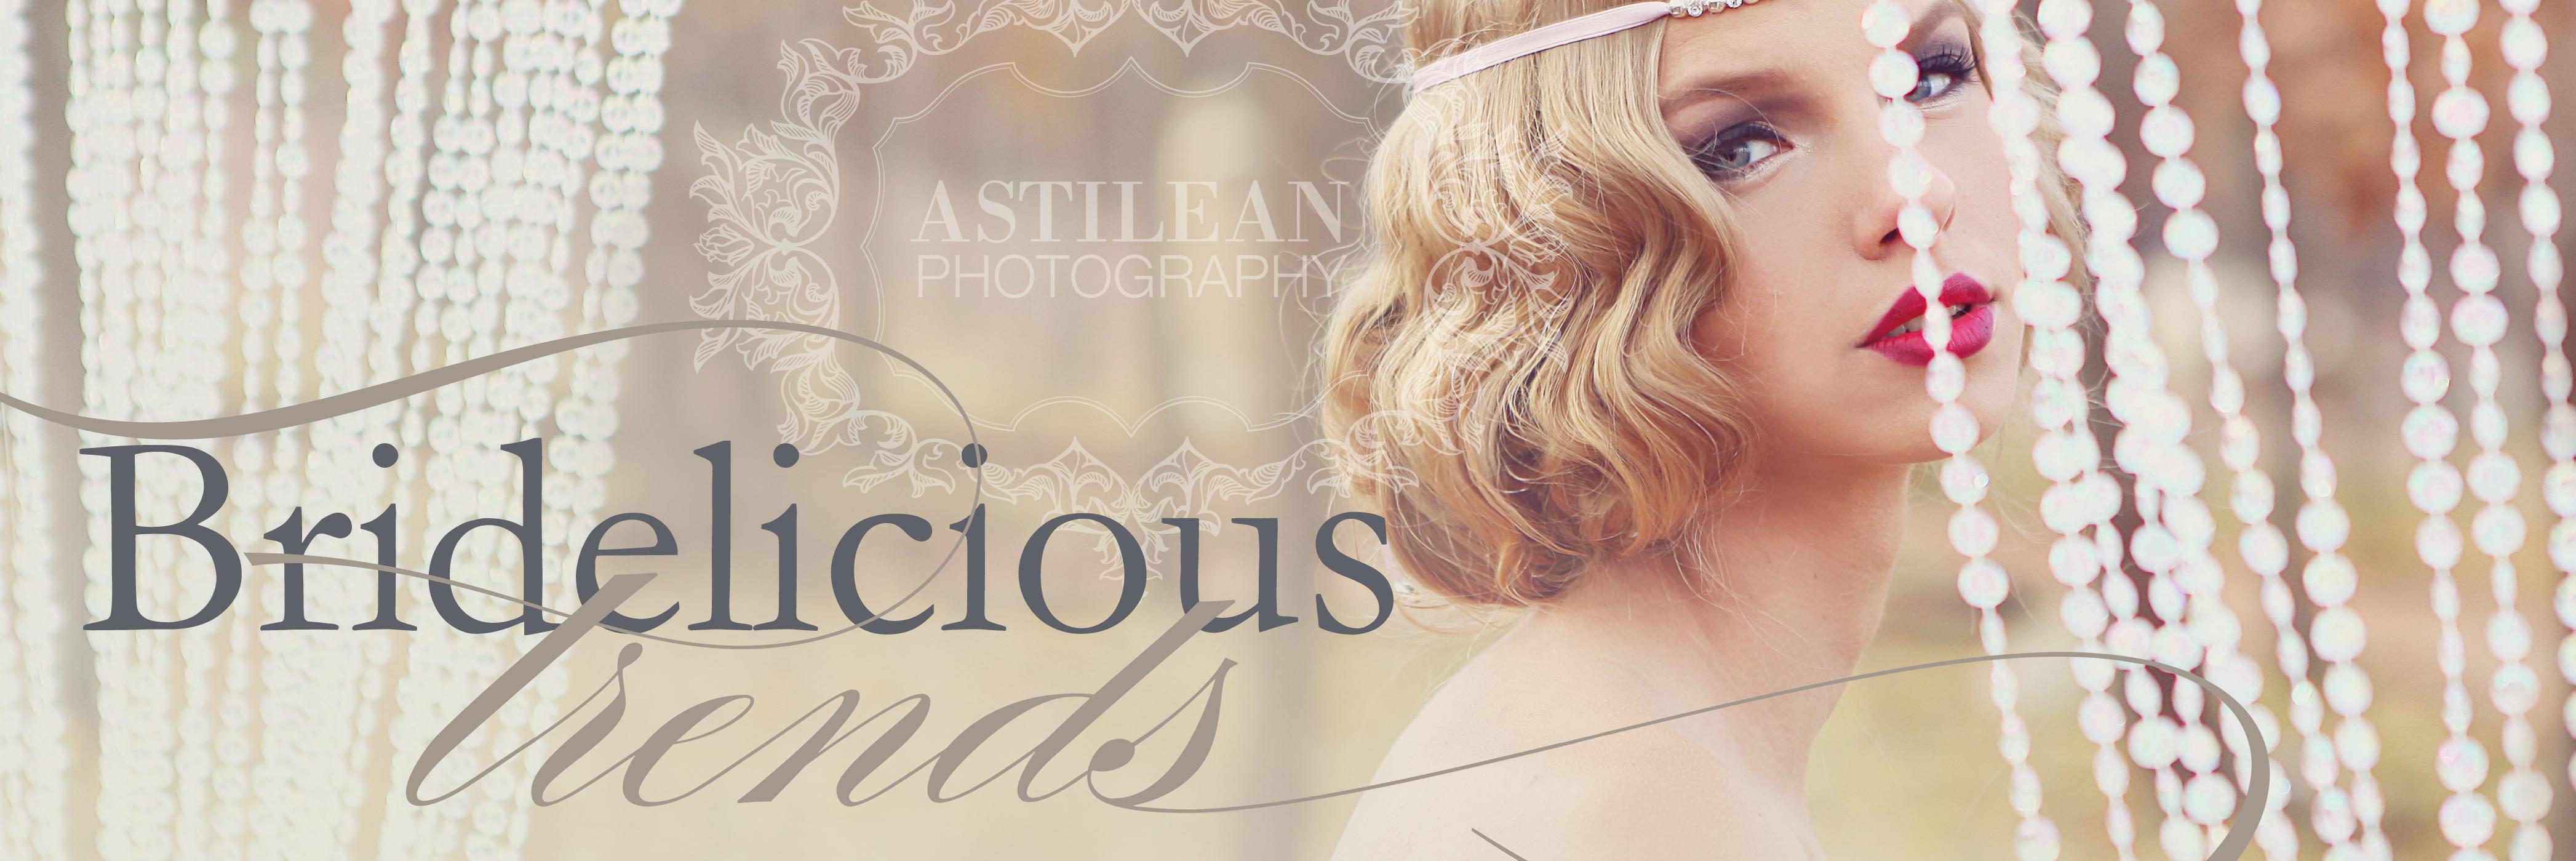 Bridelicious Trends 2